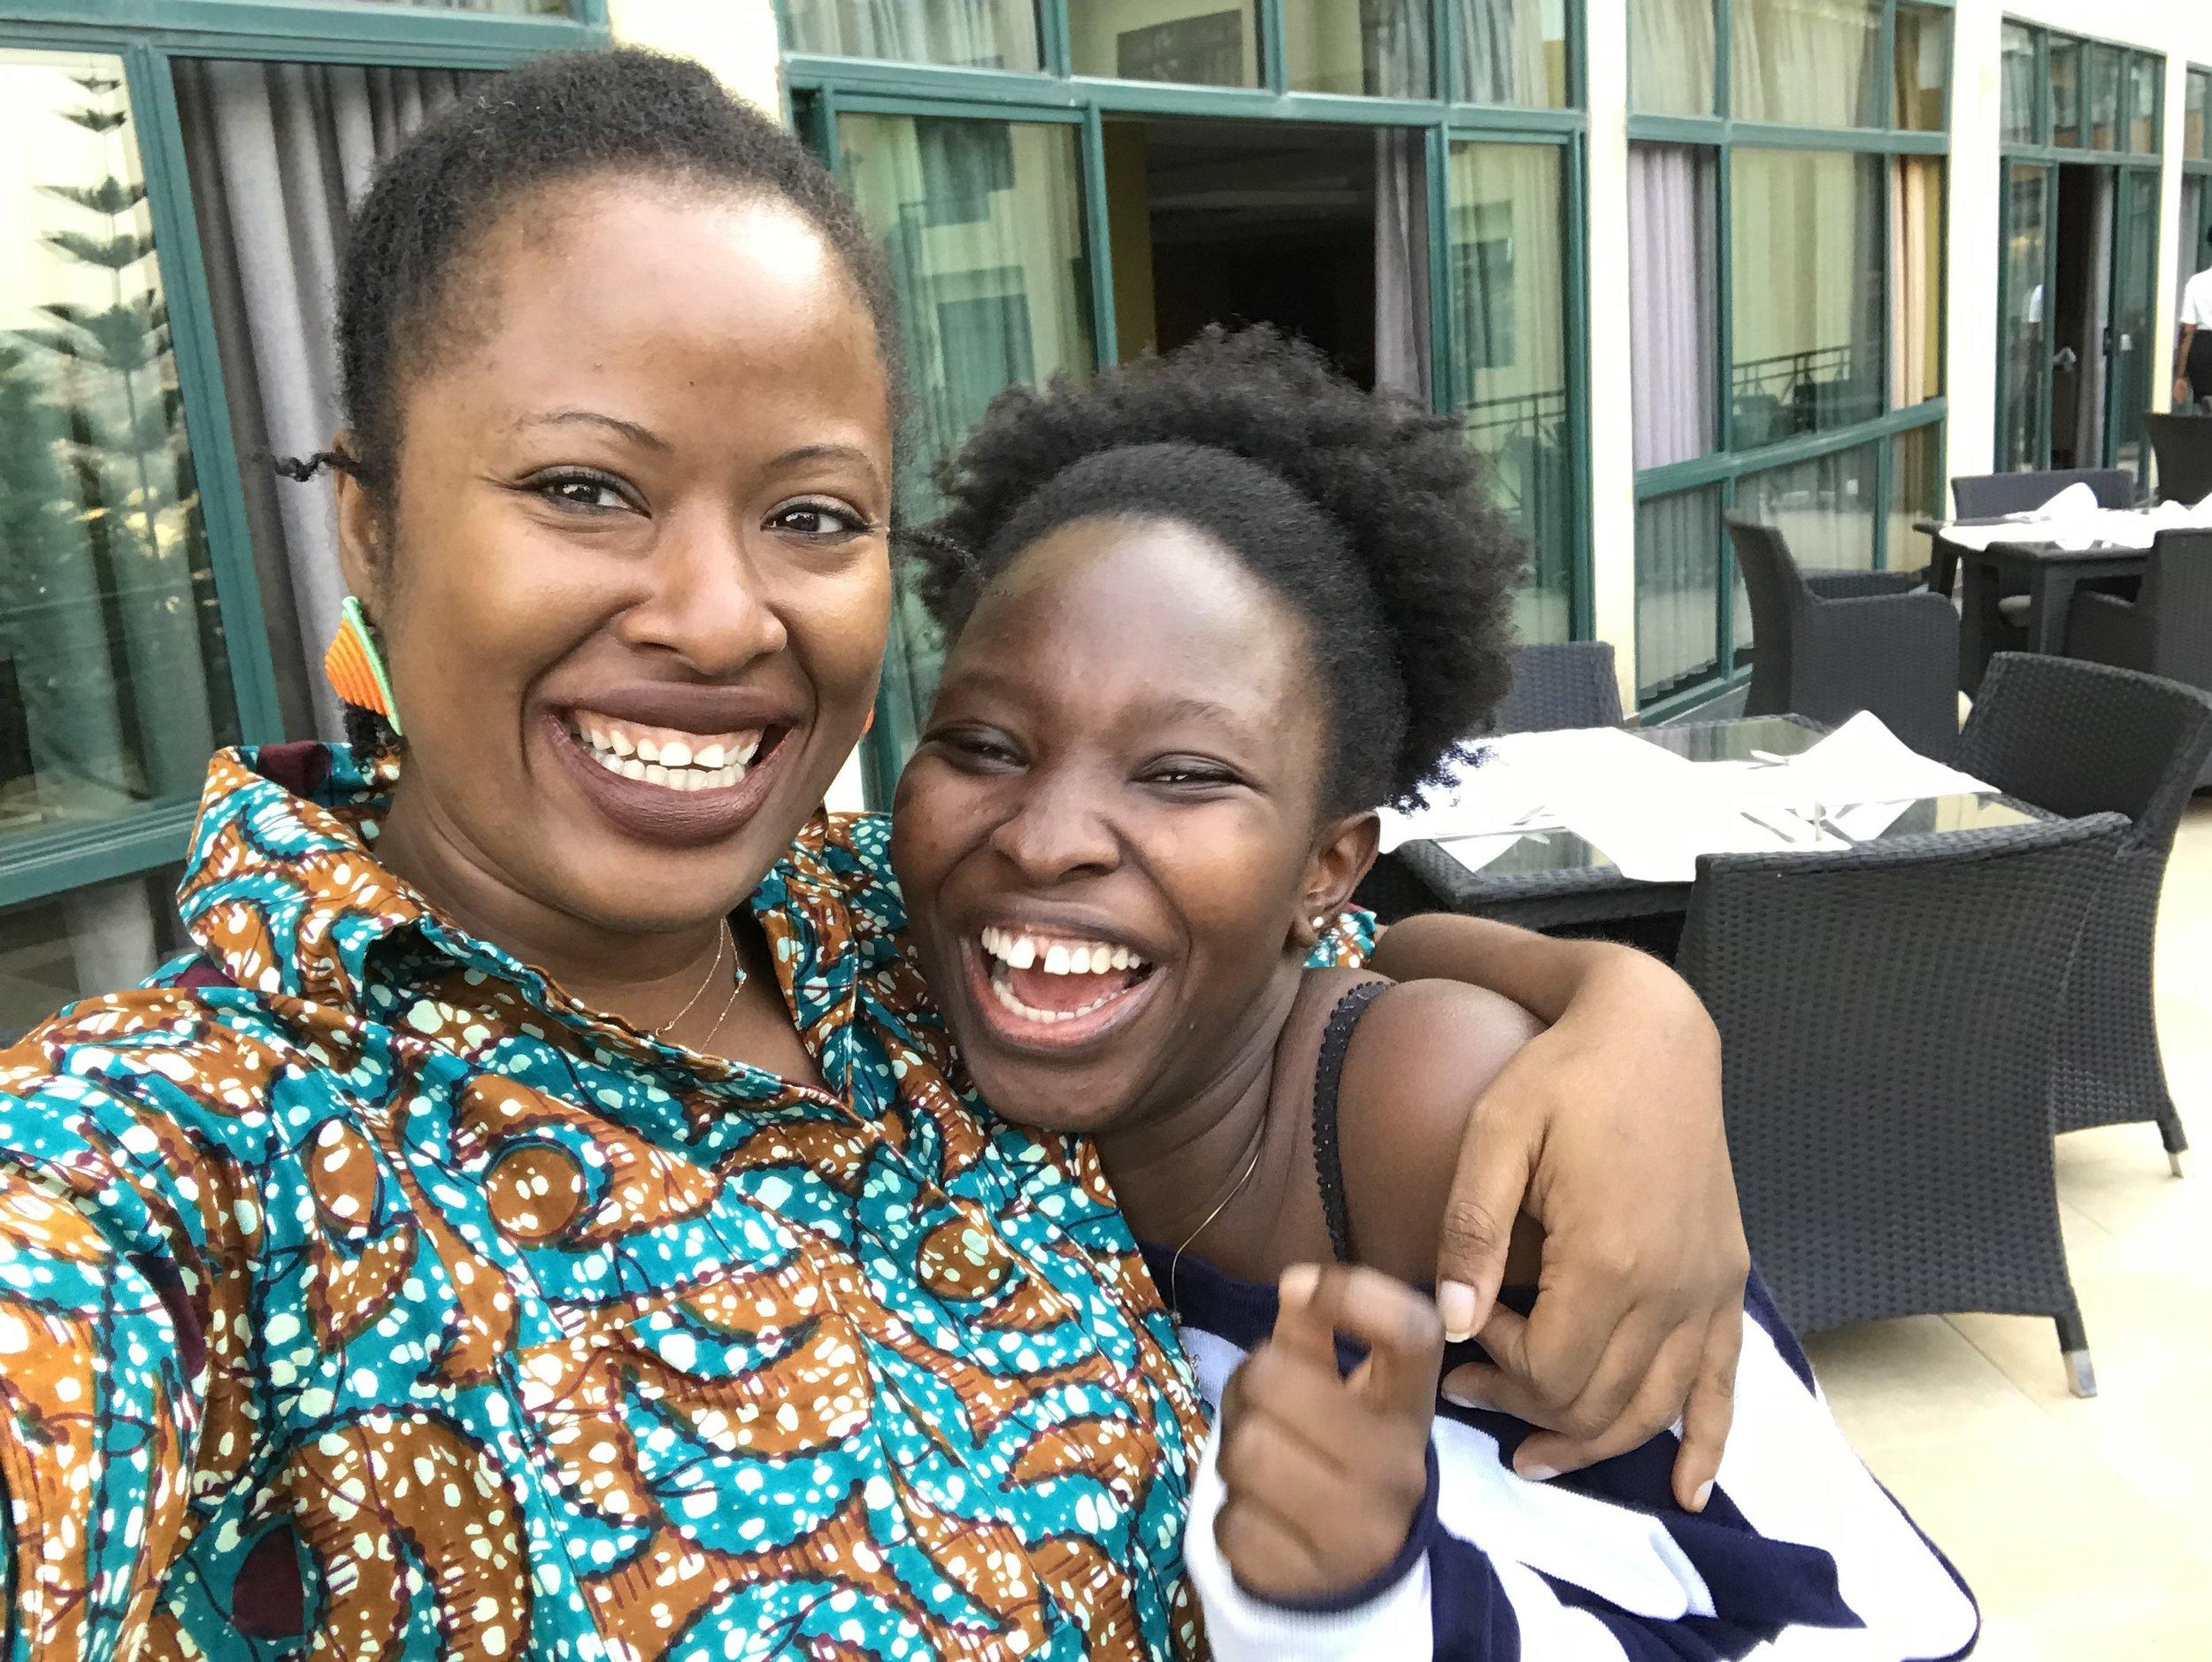 IMG_6109 2VickieRemoe-travel-kigali-rwanda-review-kwibohora25-hotels-africa.JPG